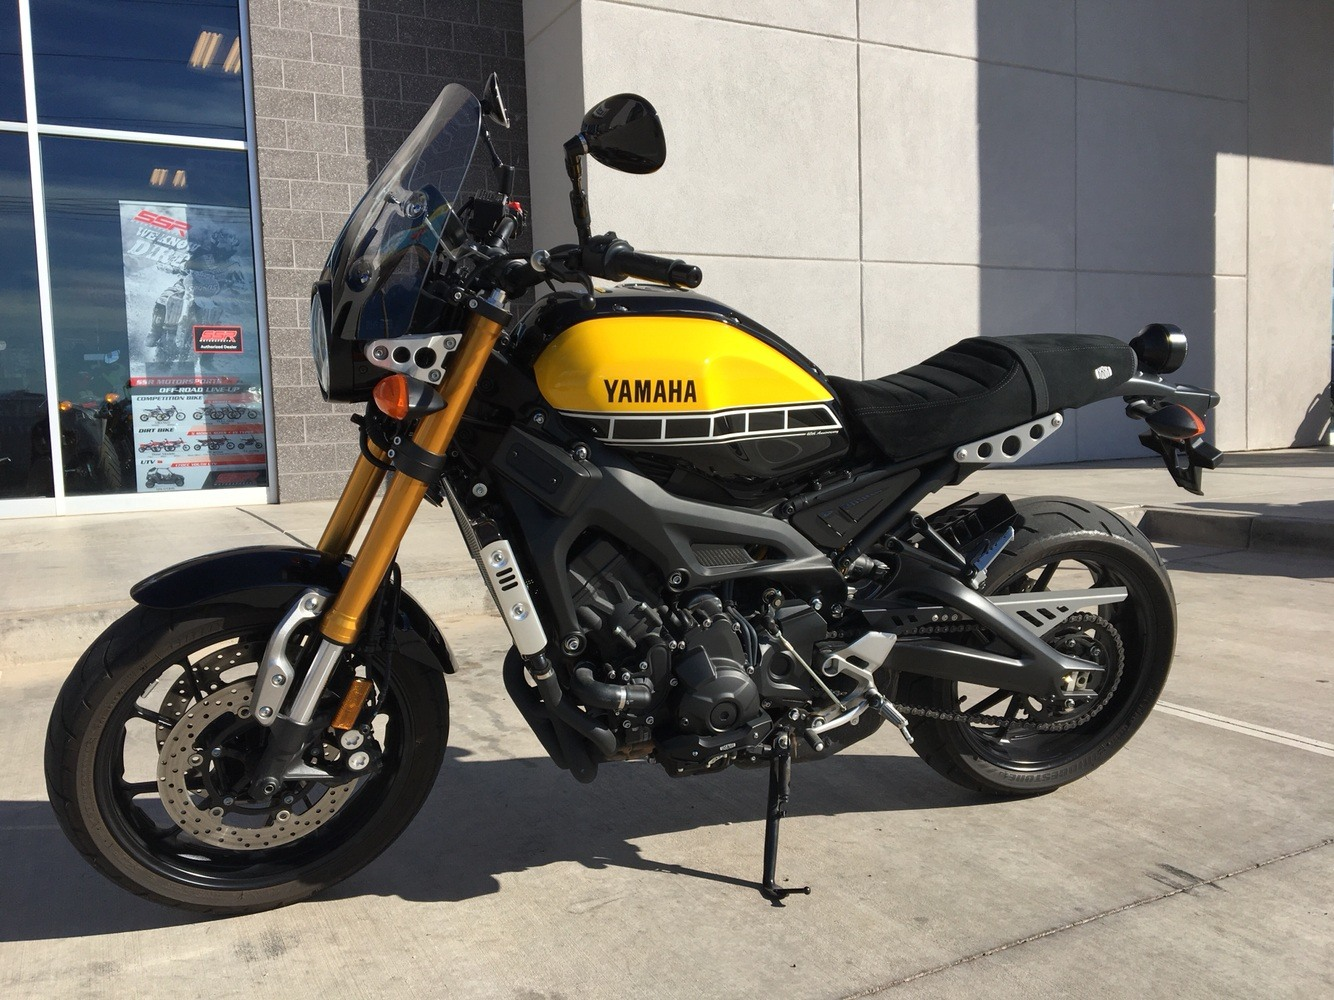 2016 Yamaha XSR900 for sale 91832